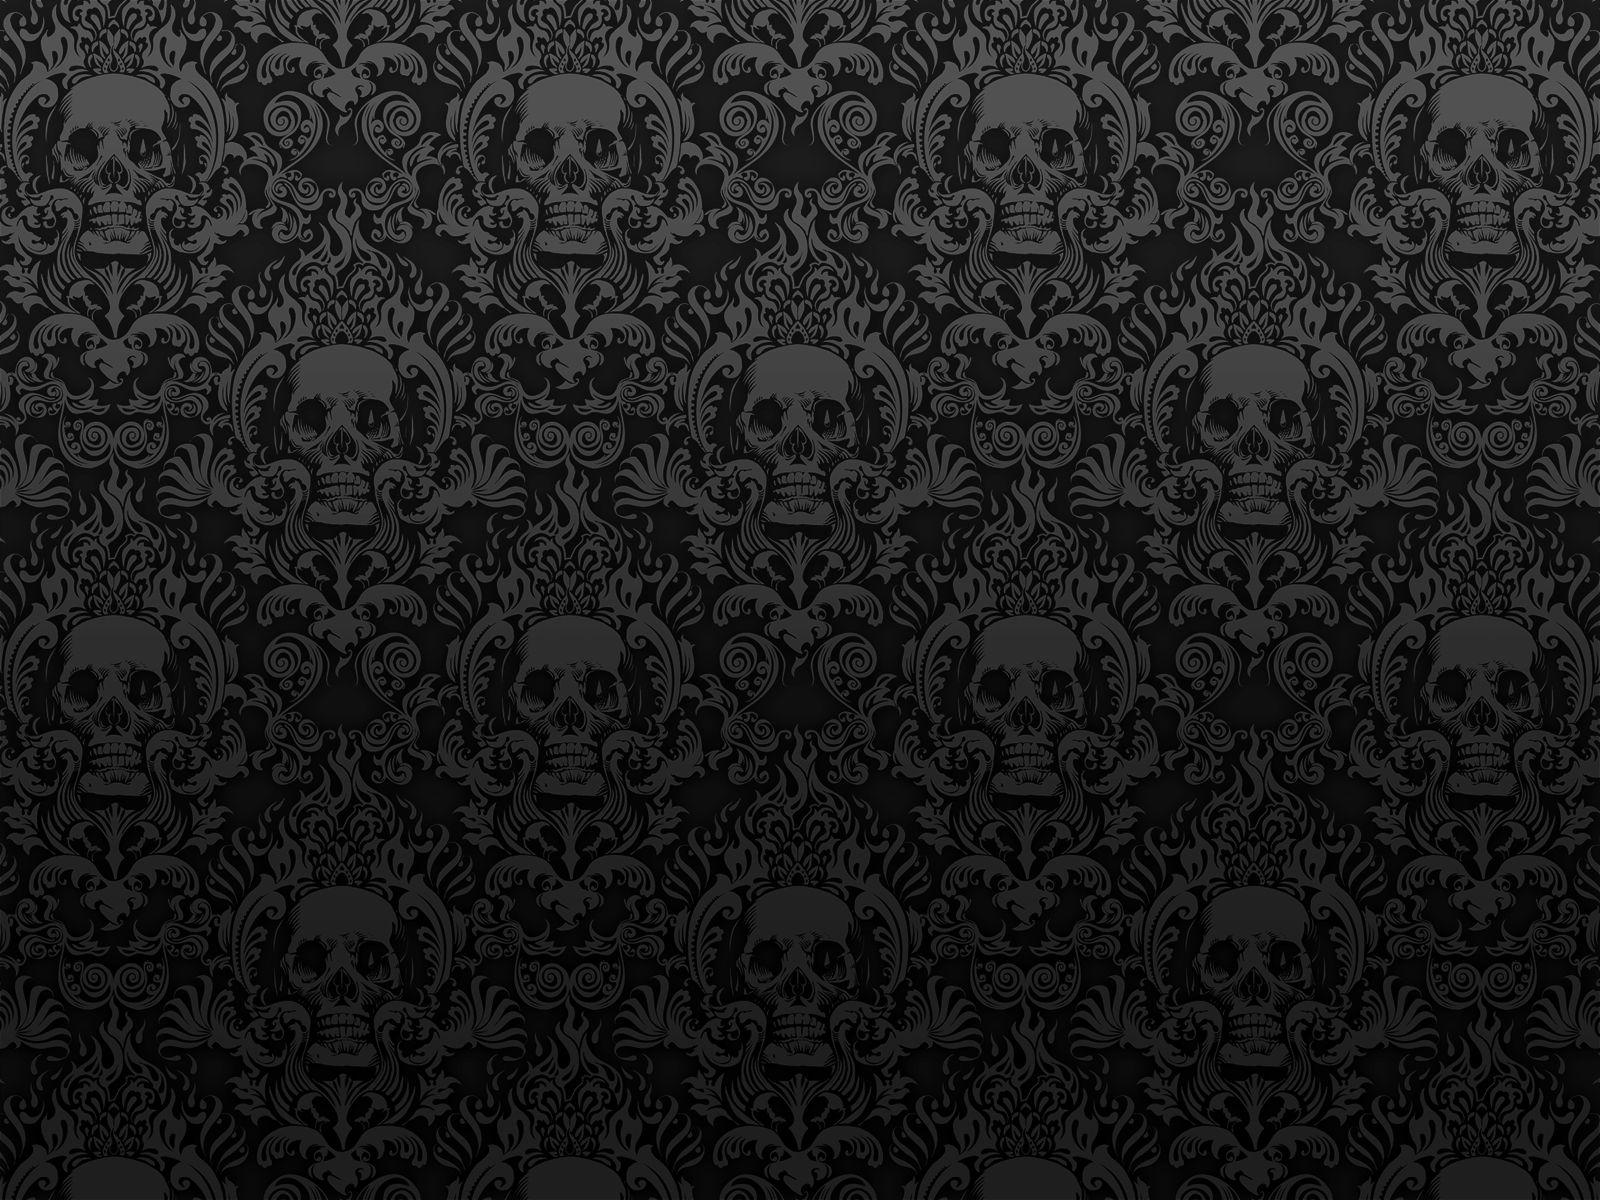 Damask Wallpaper Skull Black Dark Photography